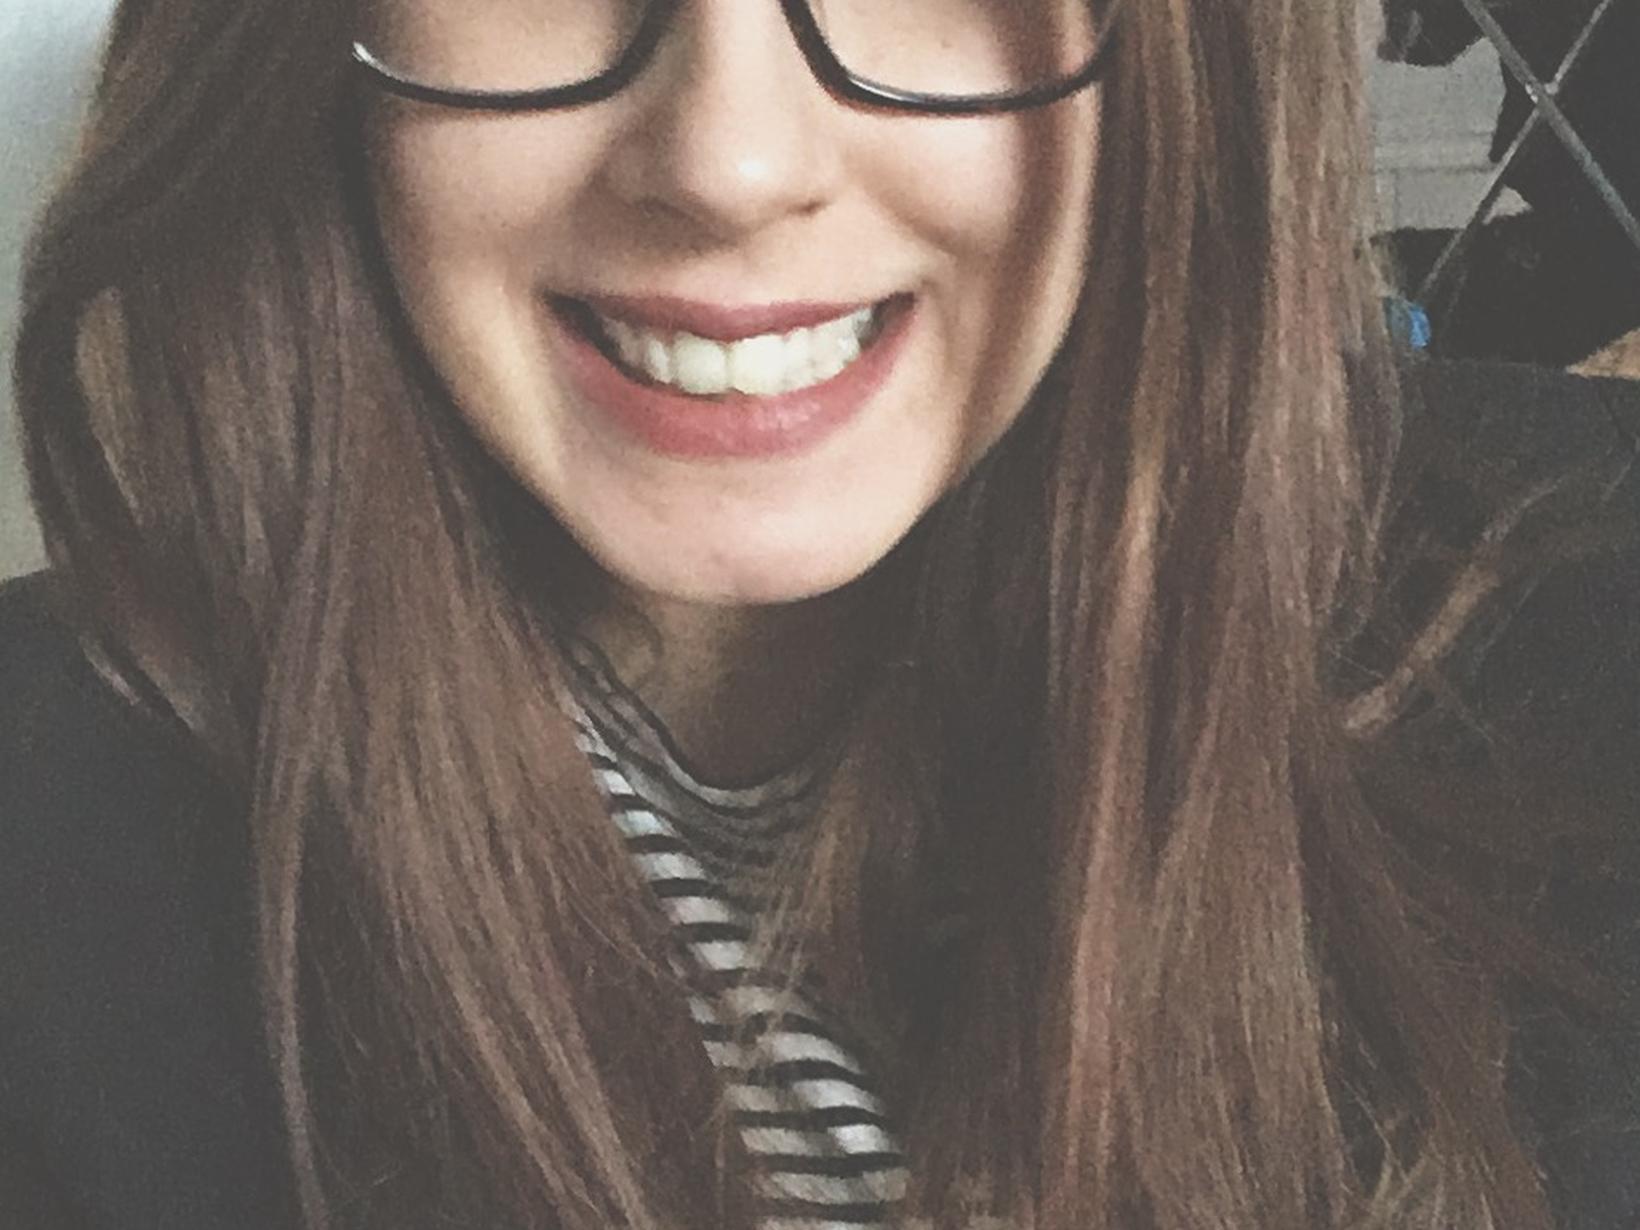 Anna from Brighton, United Kingdom